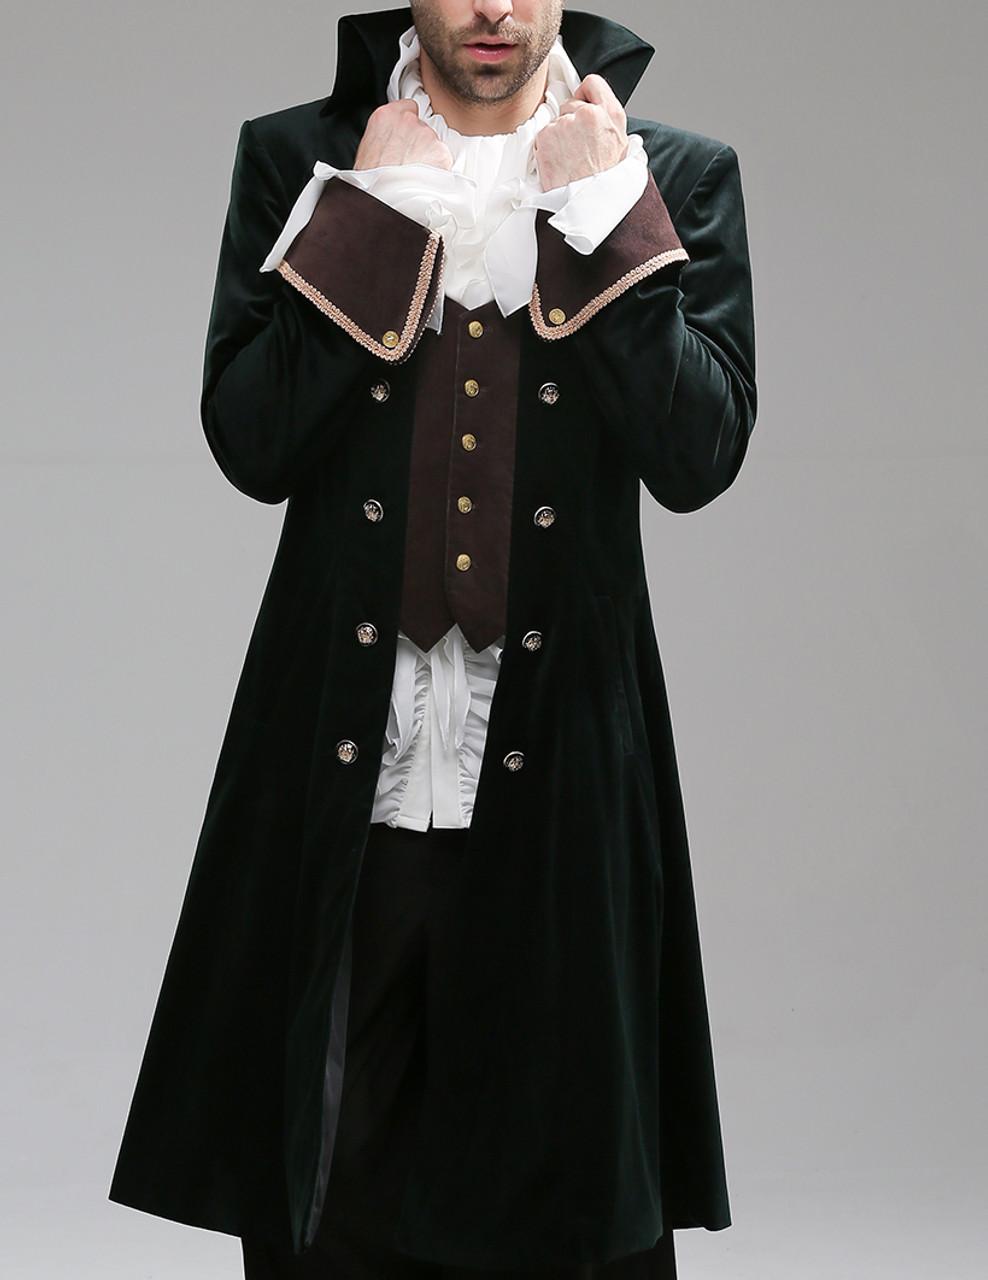 5ec2ad8a62 Whale Bones Bay, Pirate Gothic Steampunk Victorian Fine Velvet Captain  Cocktail Long Coat*2colors Man M Instant Shipping